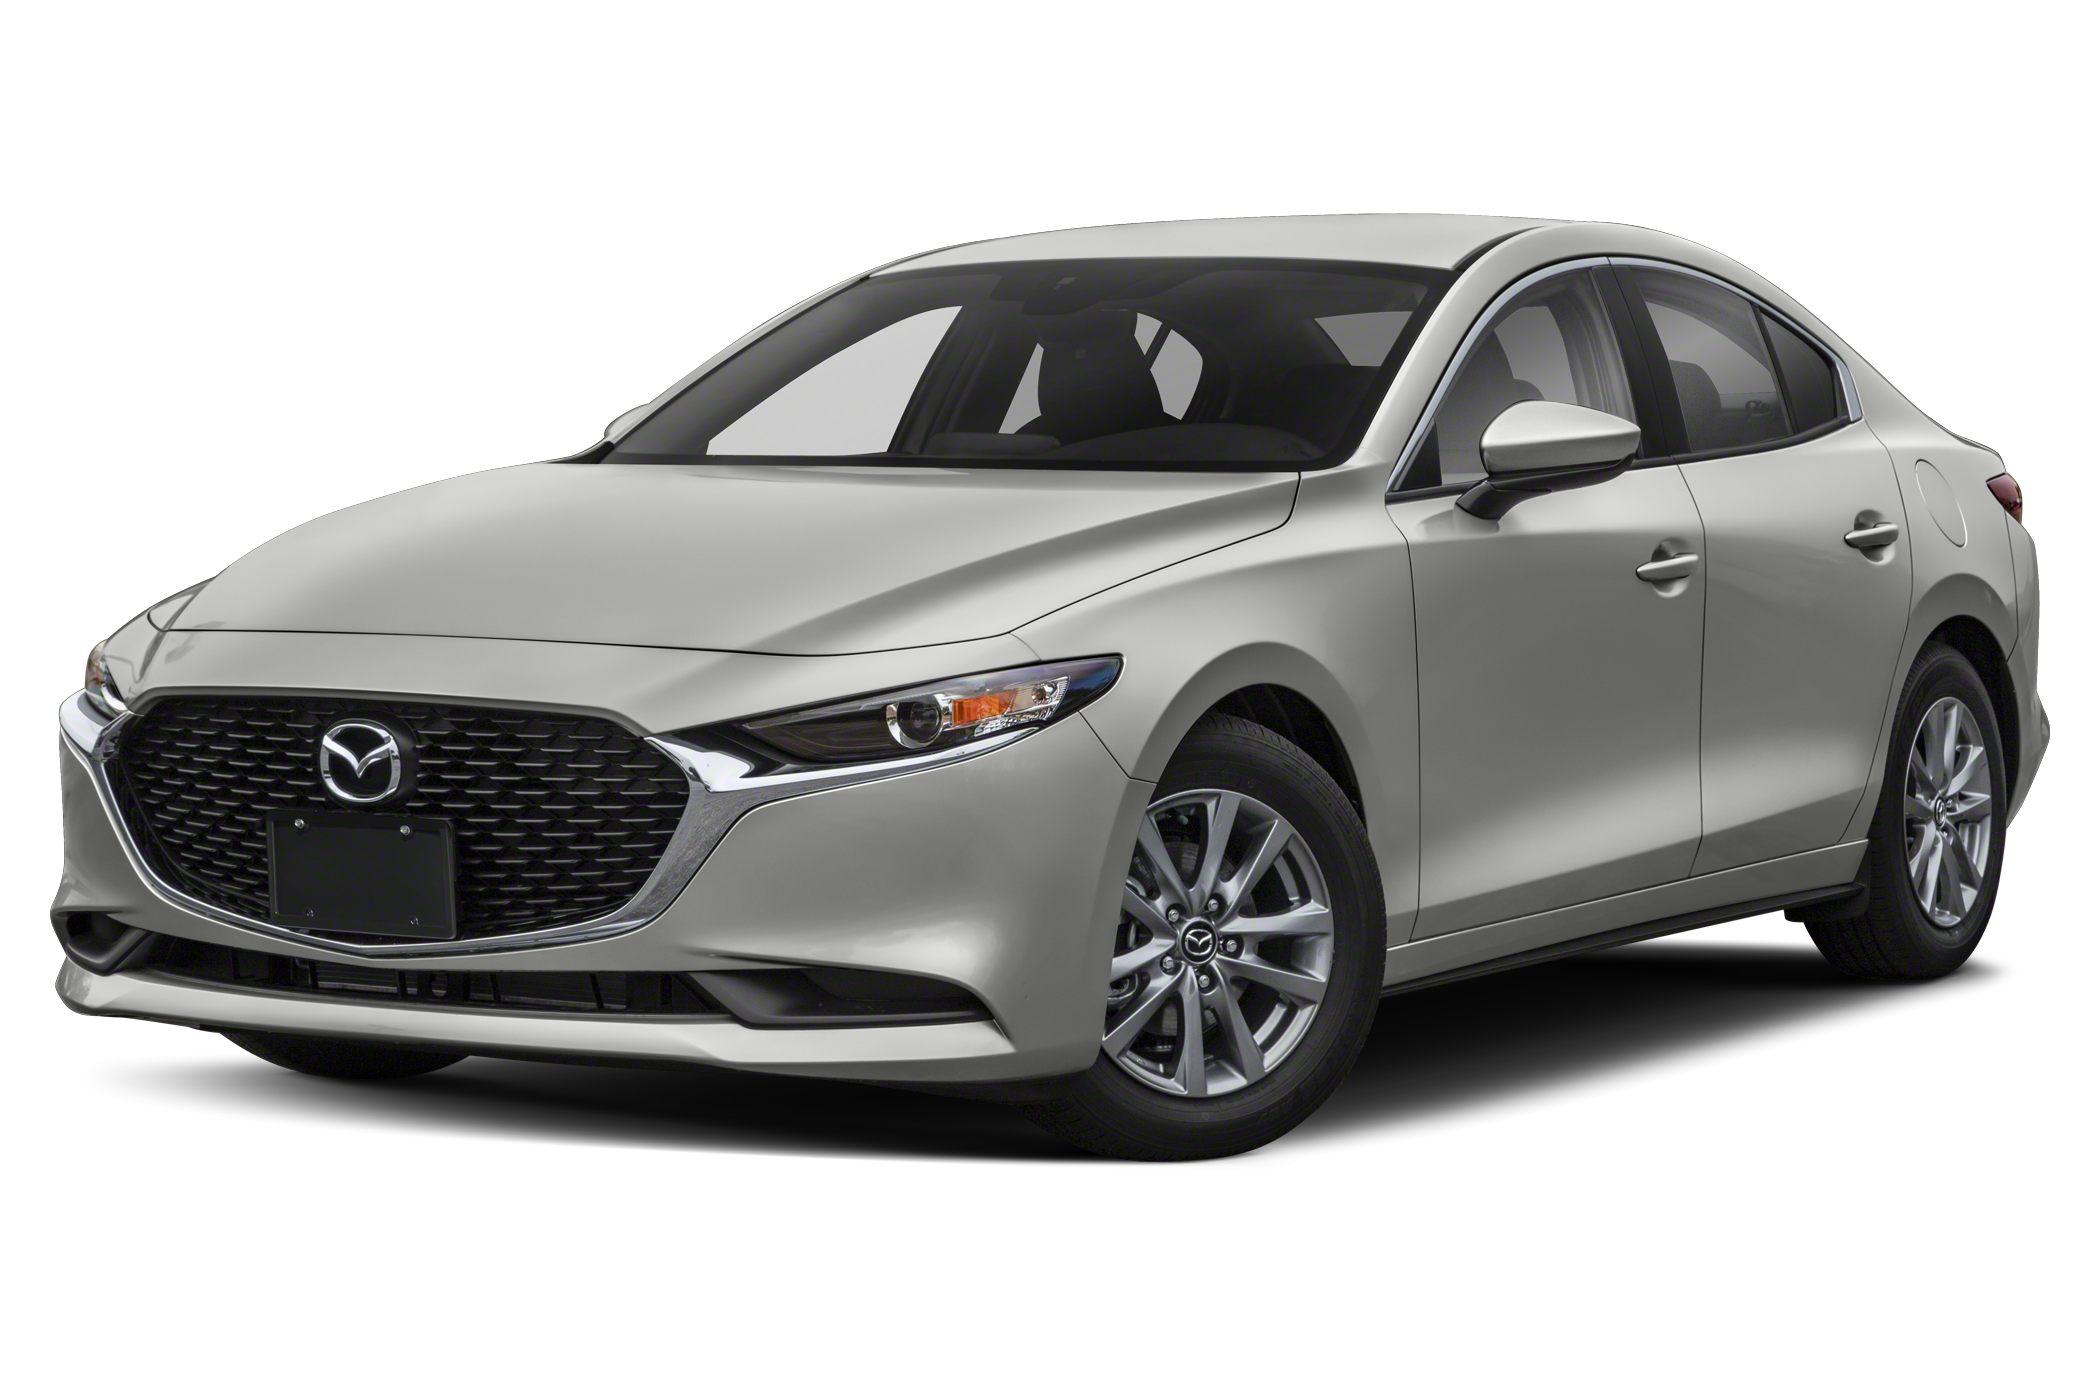 Kelebihan Kekurangan Mazda Z3 Top Model Tahun Ini